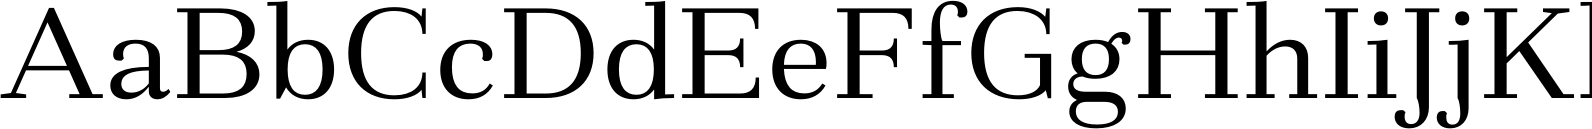 Fiorina Text